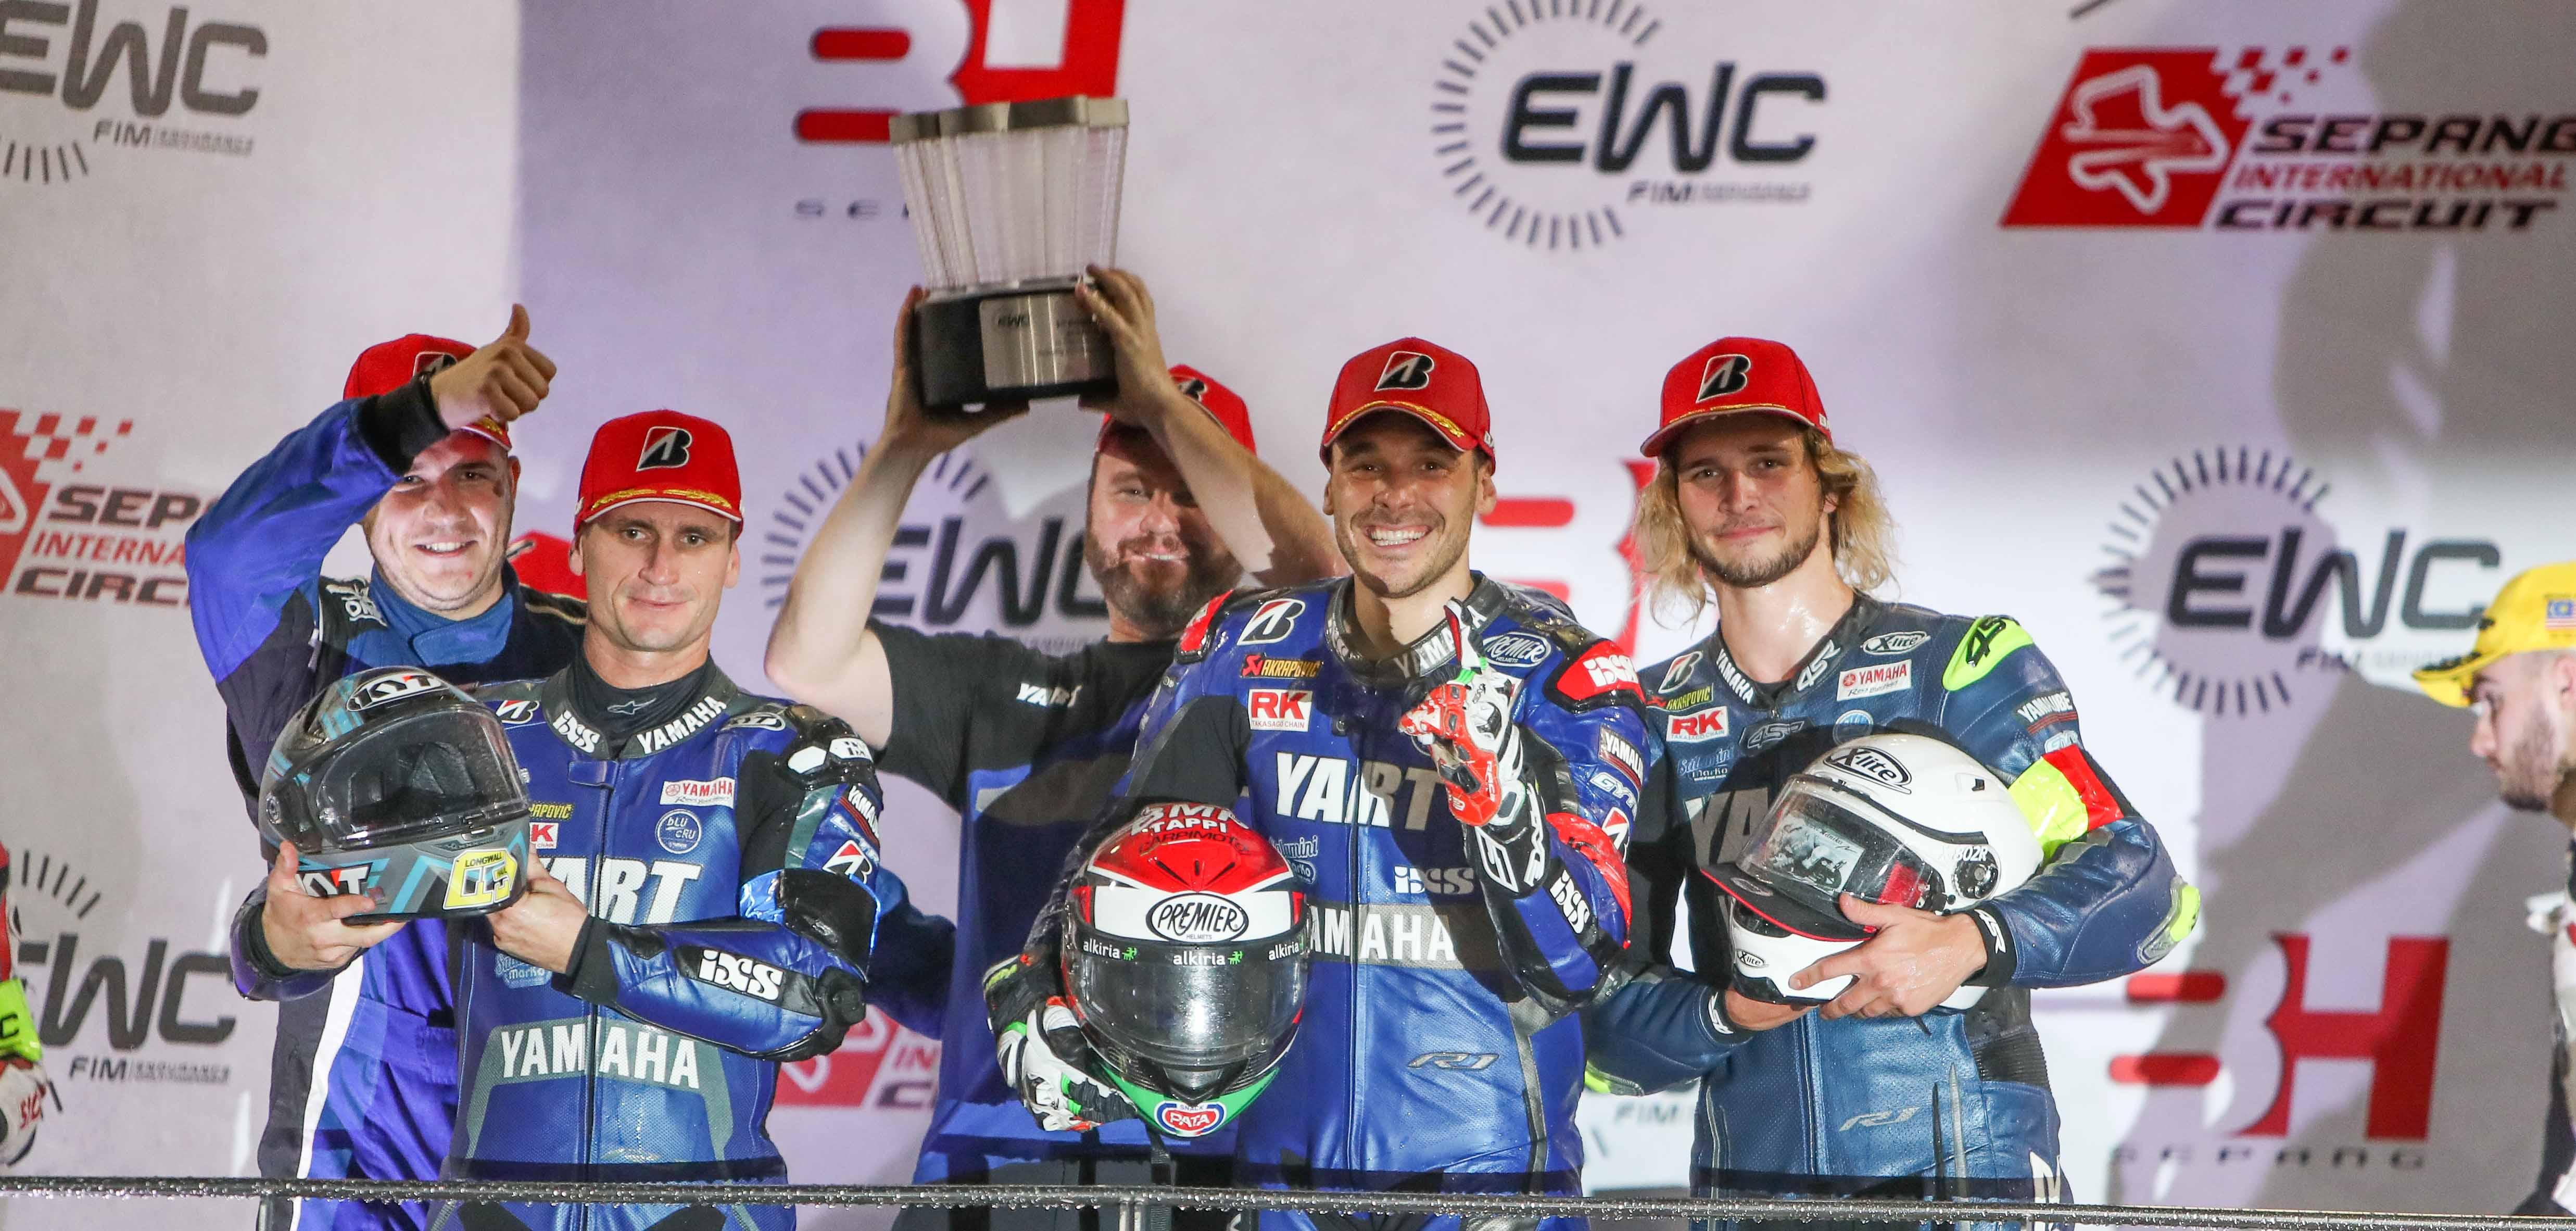 Fim_Ewc_8h_Sepang_2019_YART Yamaha, Fritz Marvin, Canepa Niccolo, Parkes Broc, Yamaha YZF R1, Formula EWC